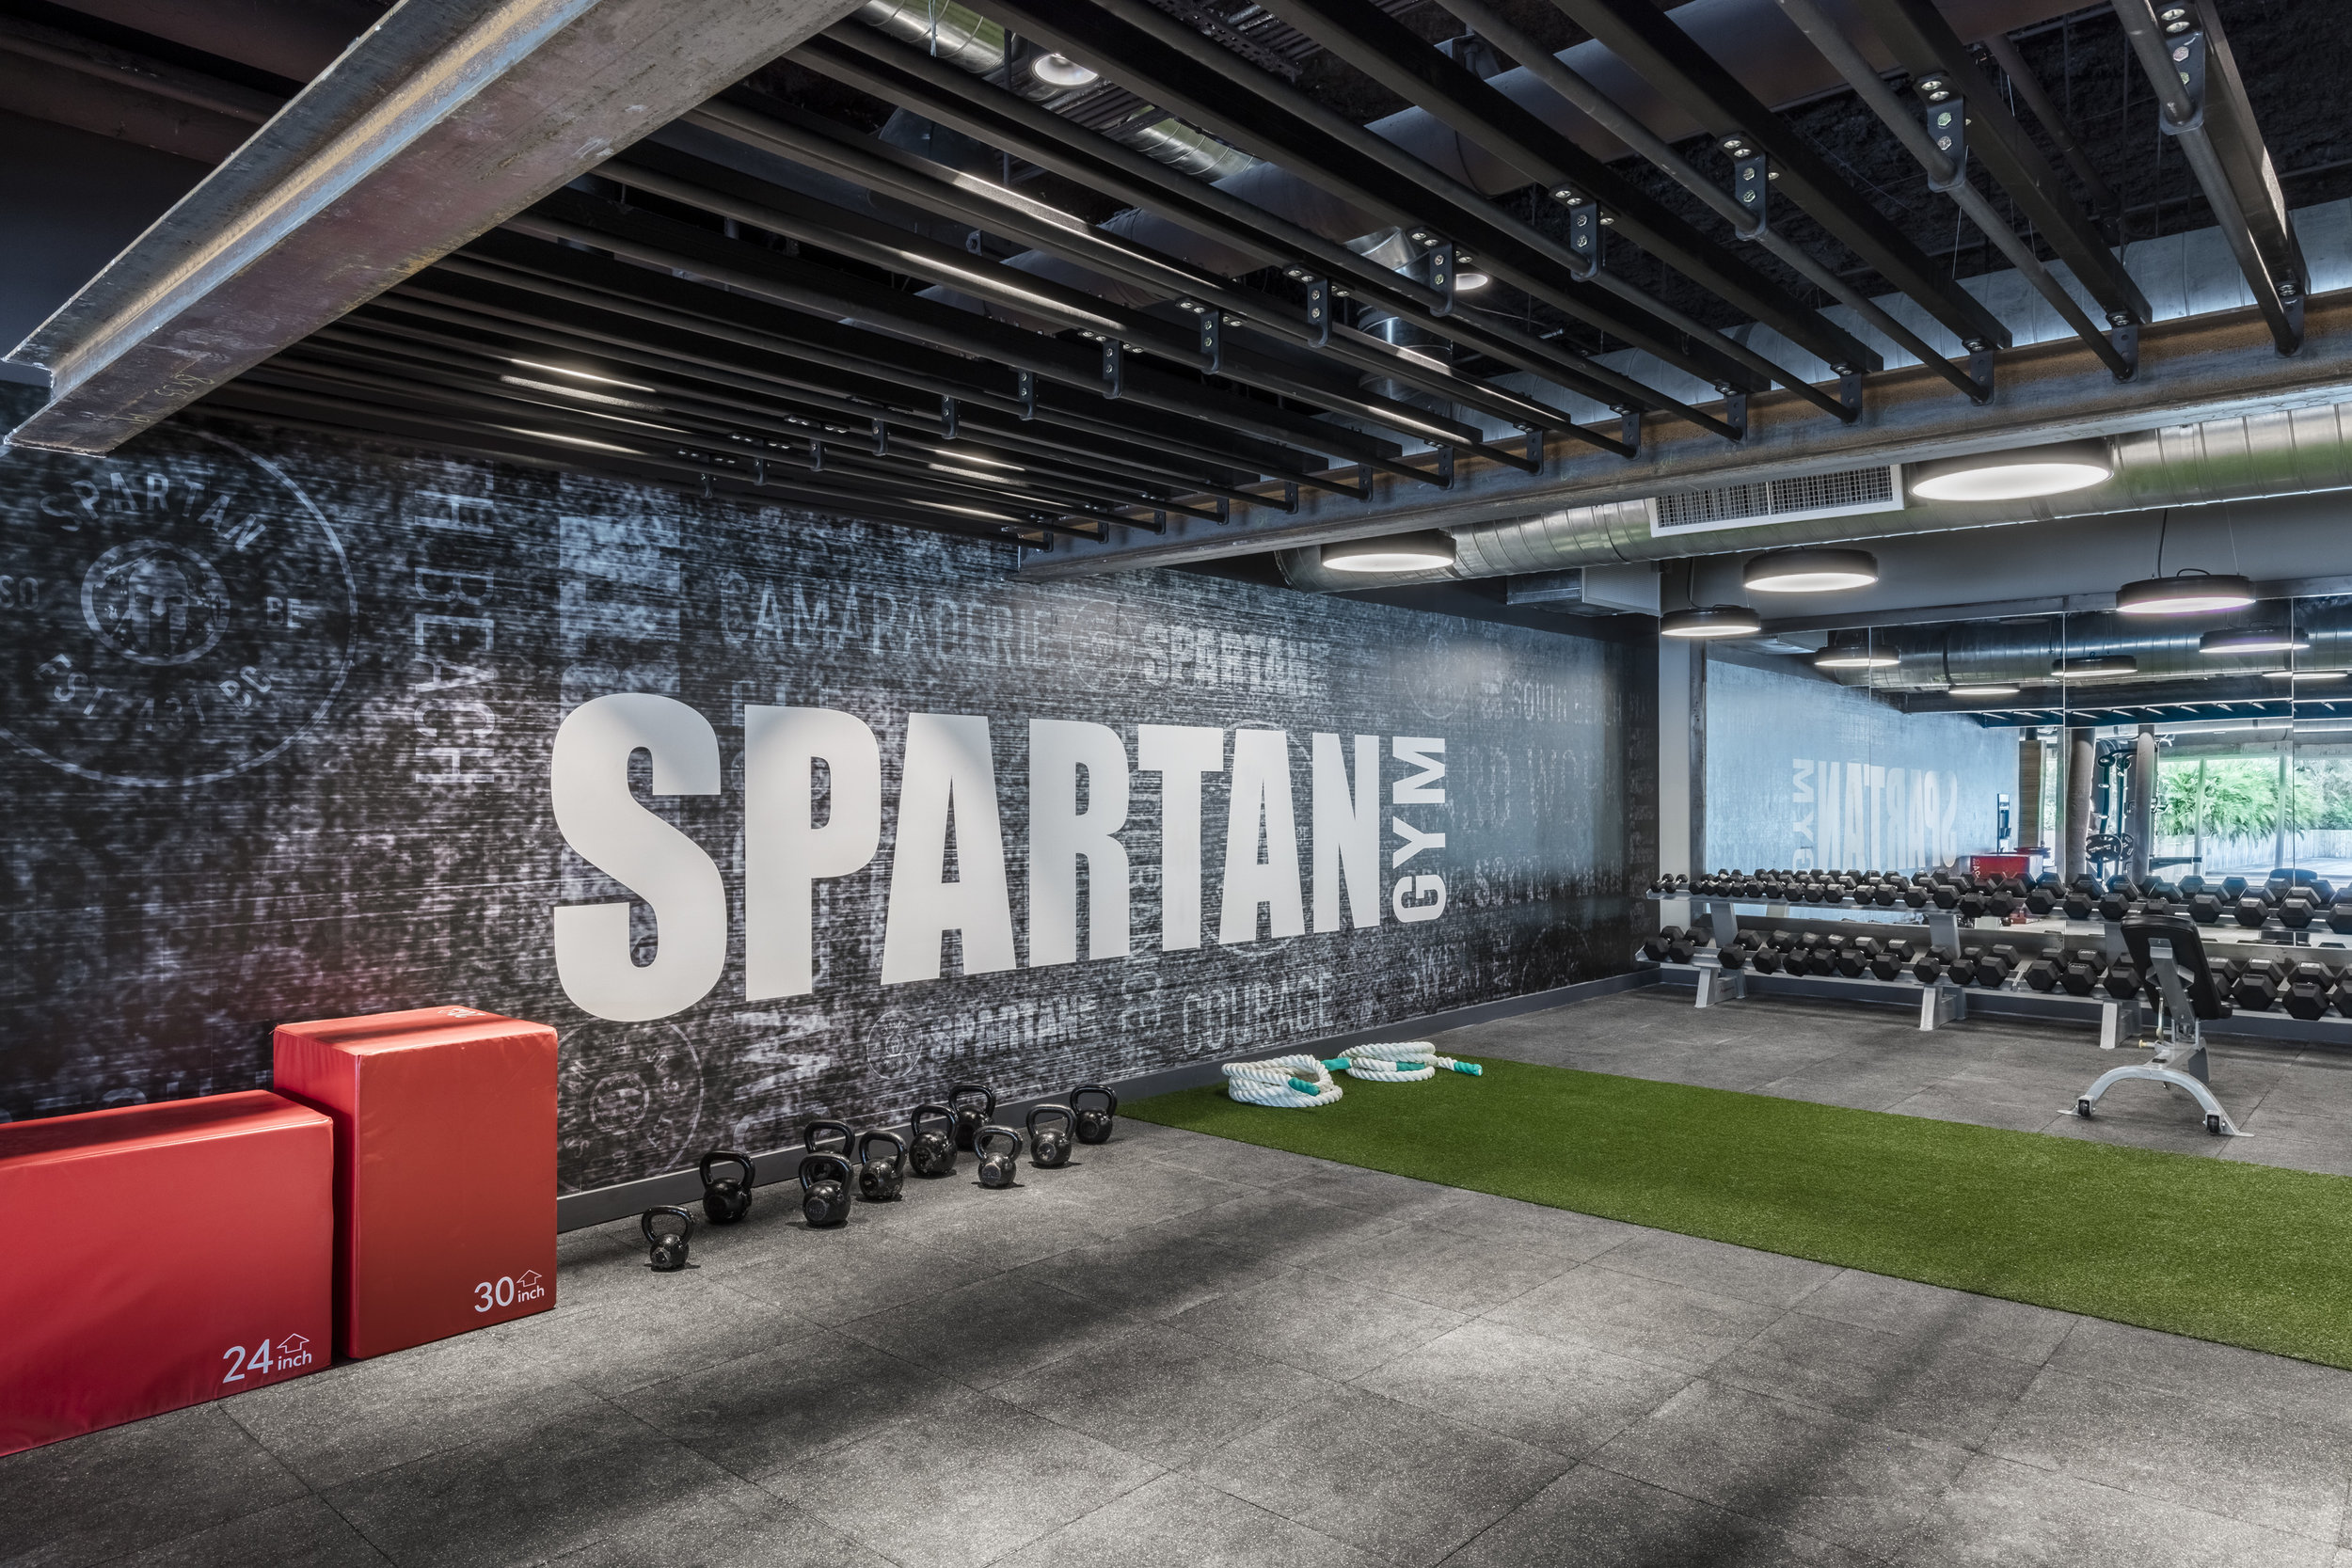 Spartan_Gym_1Hotel_Miami_0023-HDR-Edit3000_Pixels.jpg